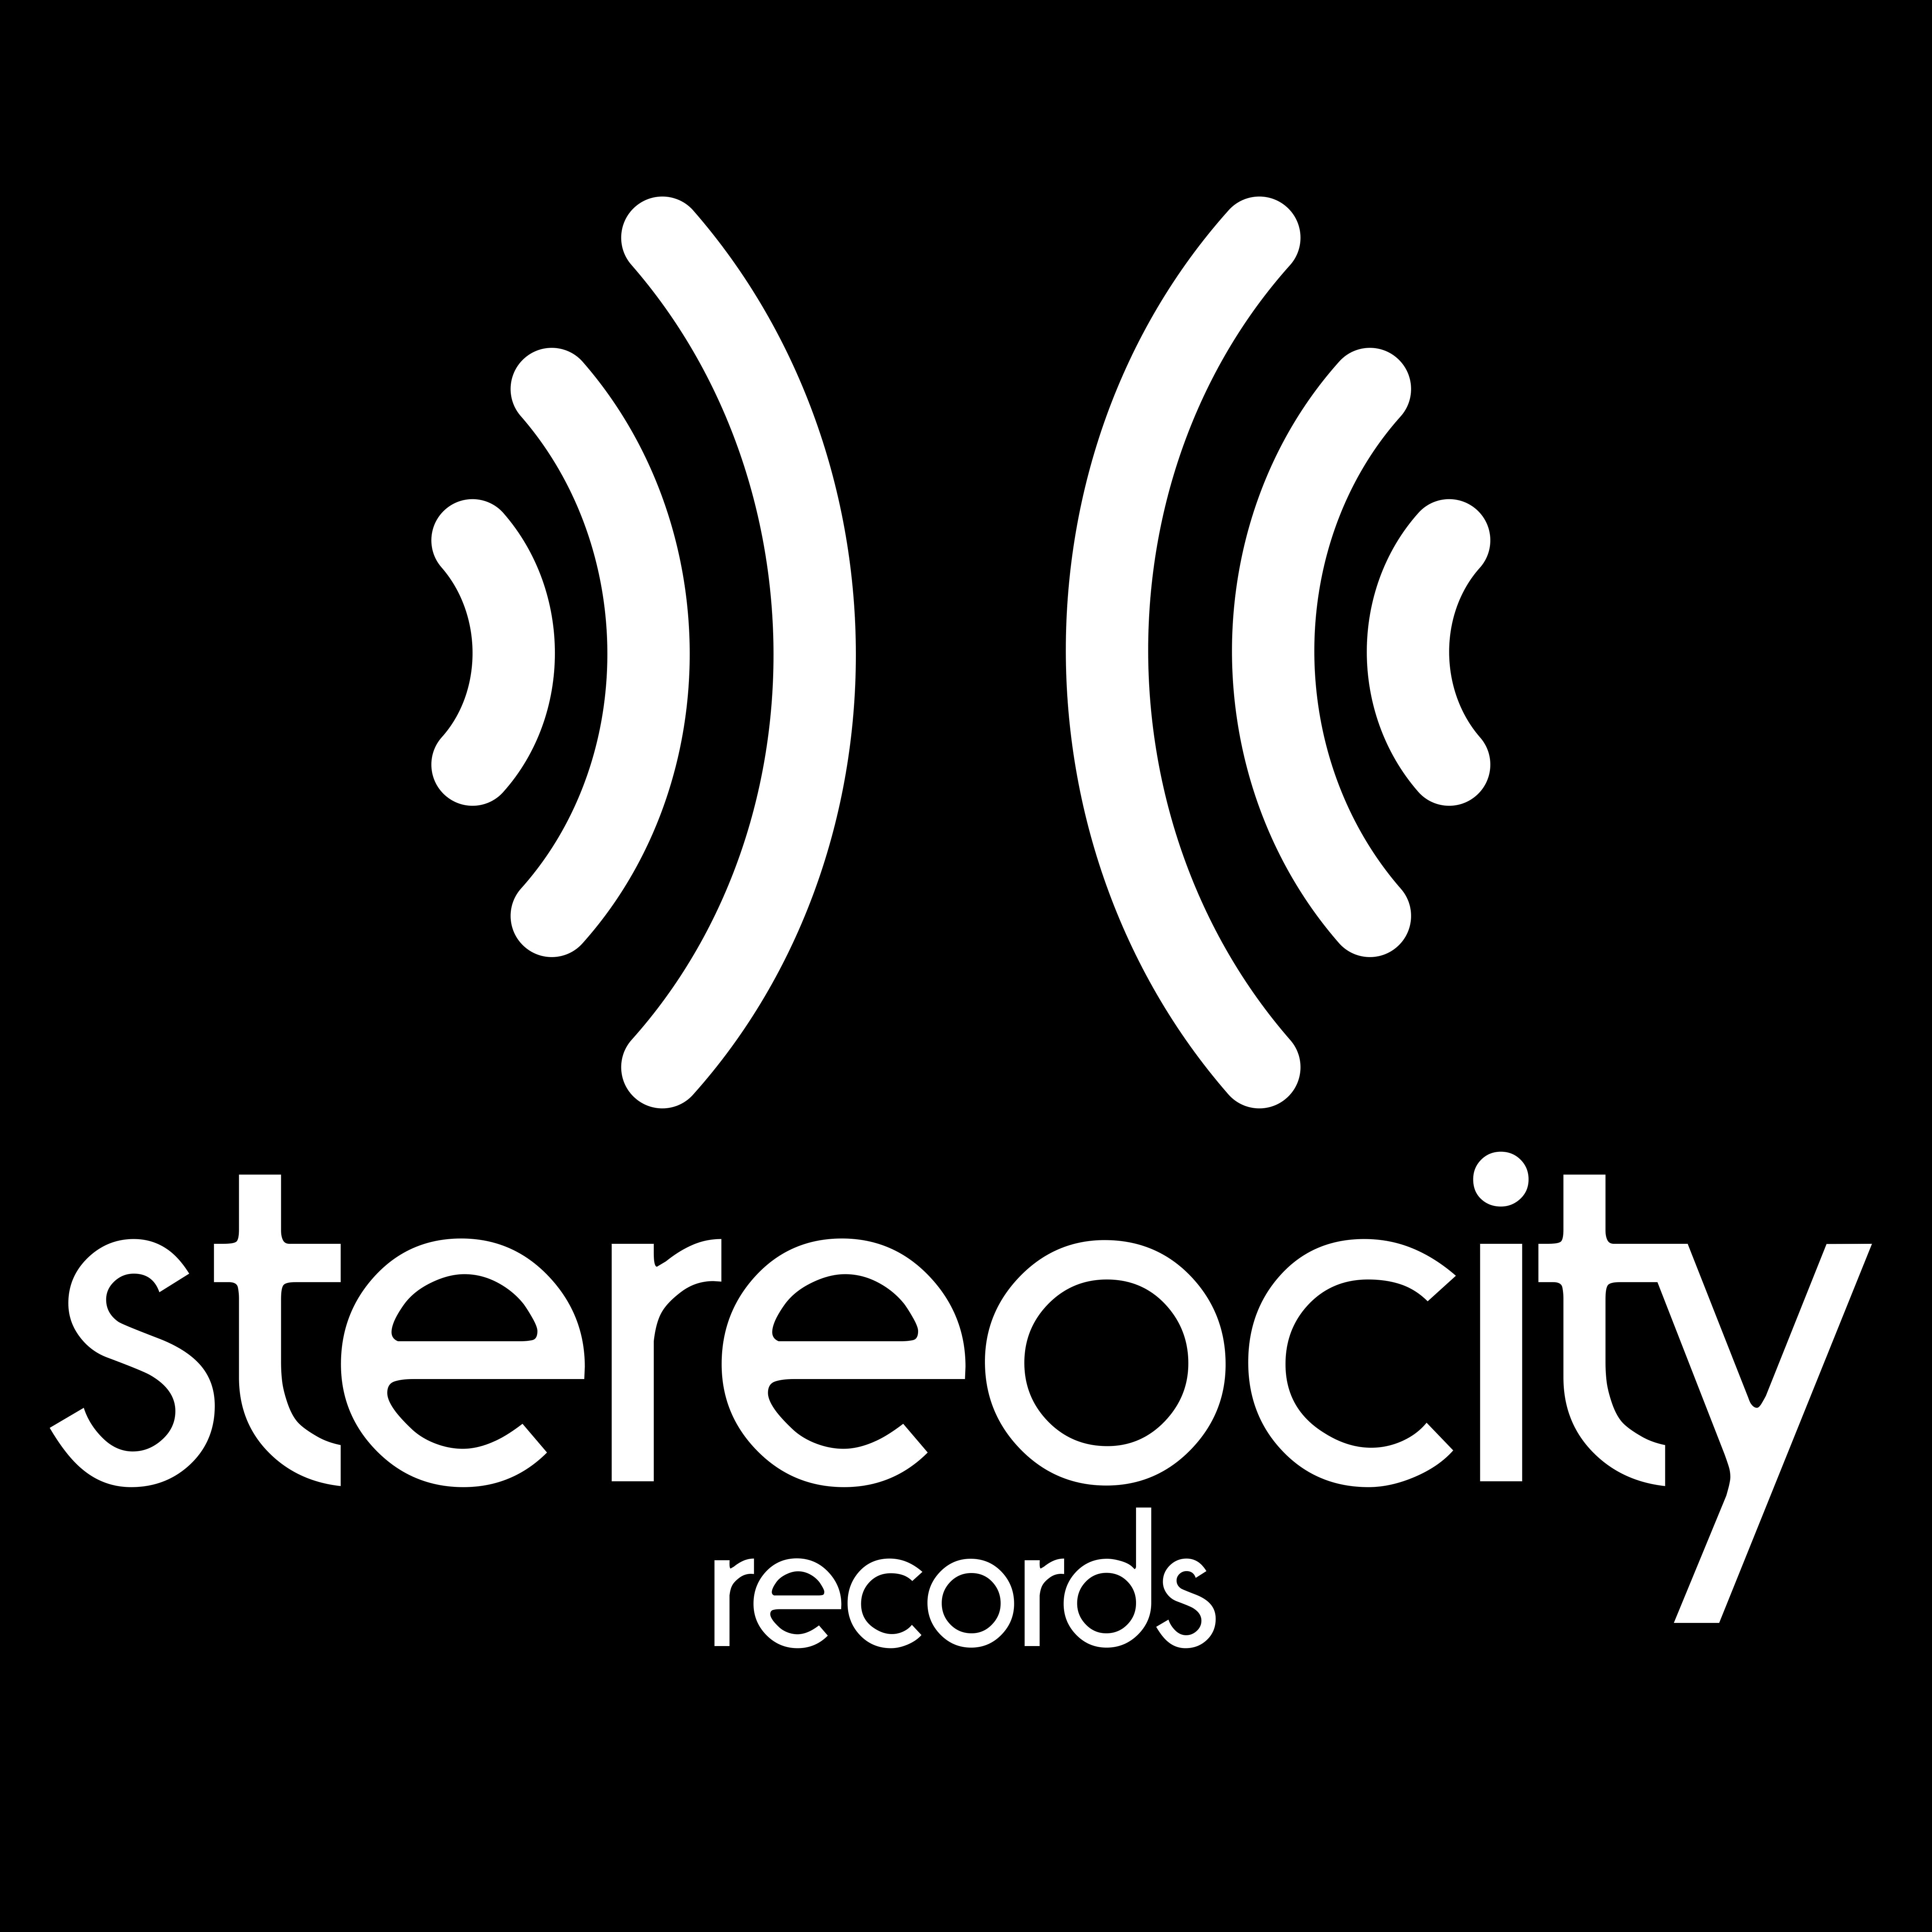 Stereocity